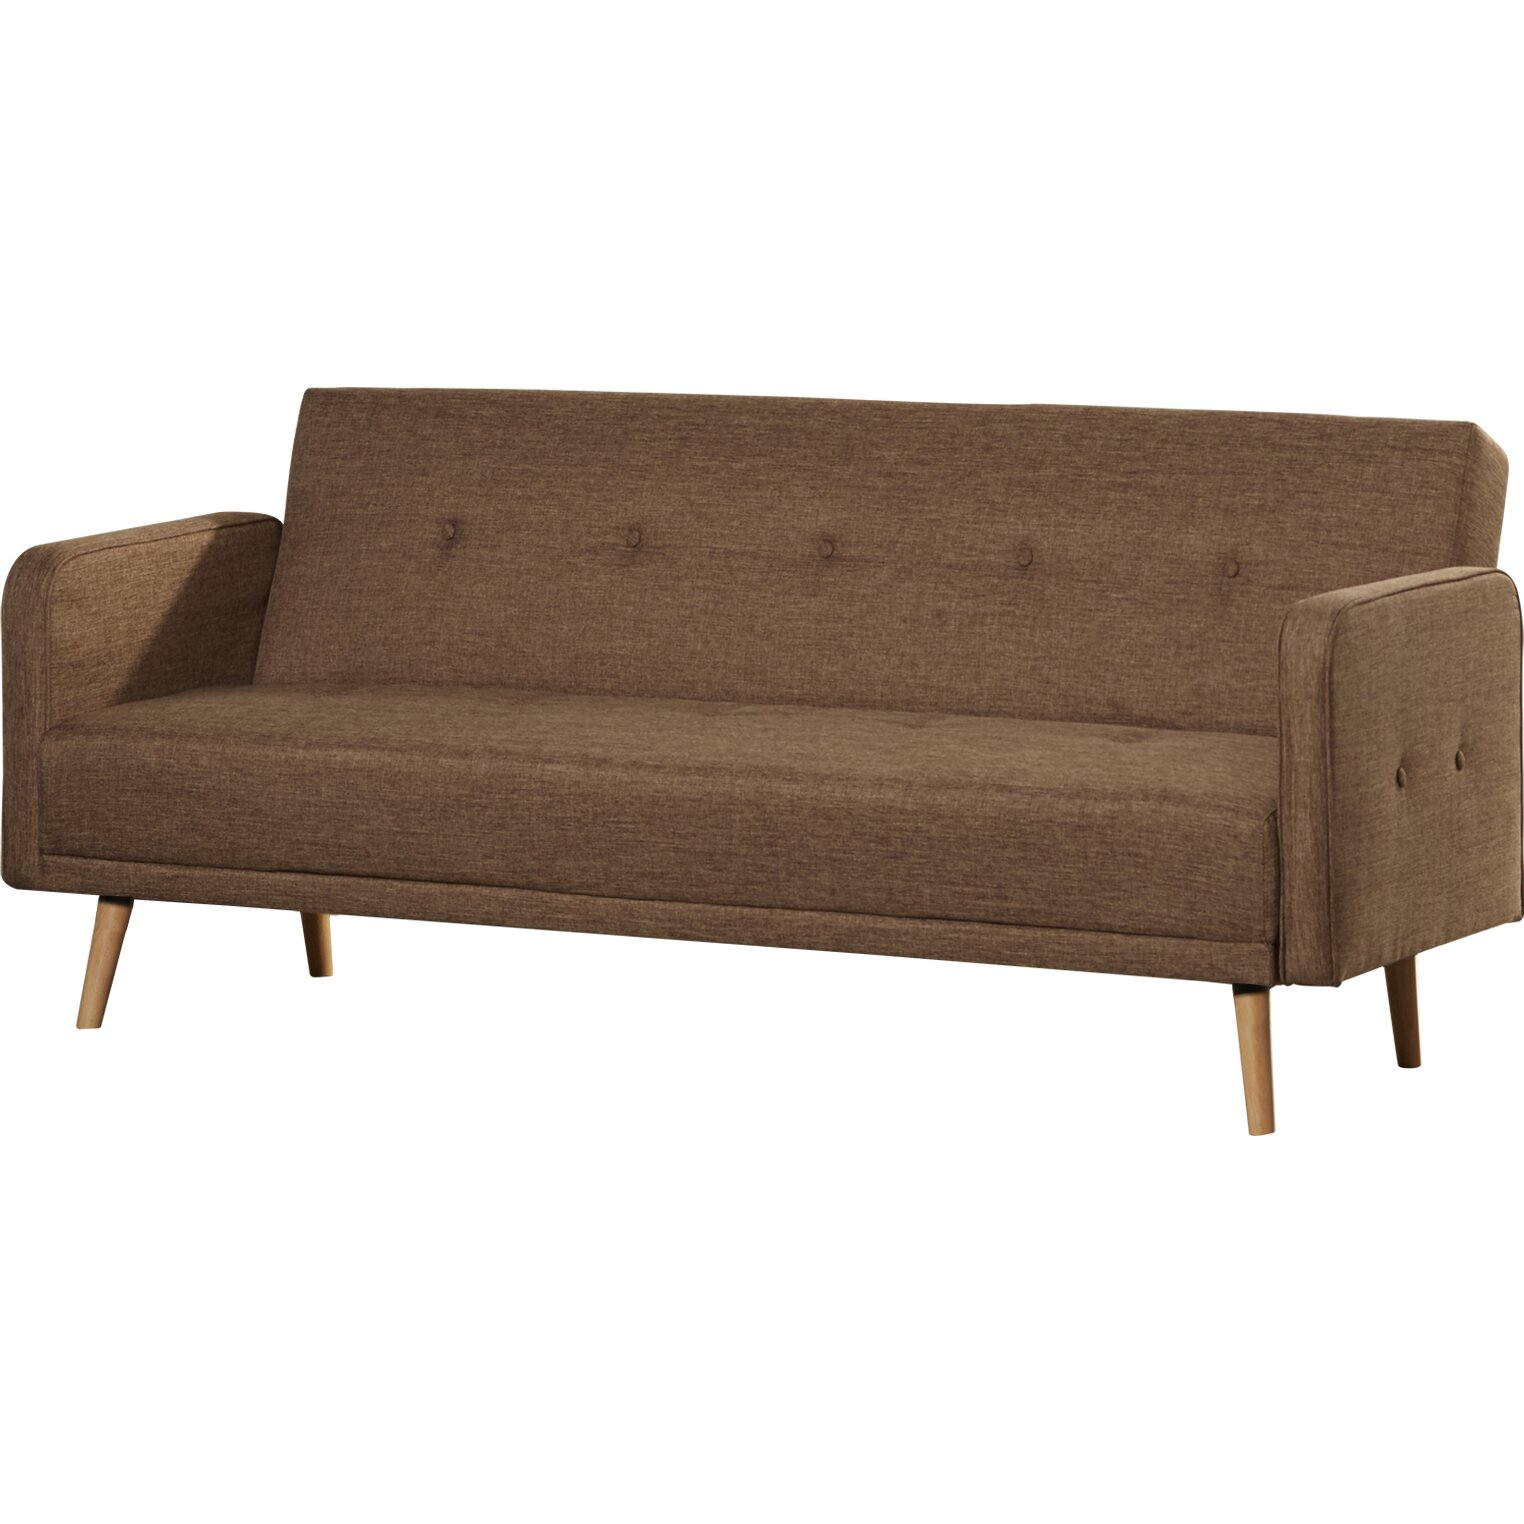 clic clac sofa bed 28 images tornado clic clac sofa bed jb furniture manhattan 110cm black. Black Bedroom Furniture Sets. Home Design Ideas